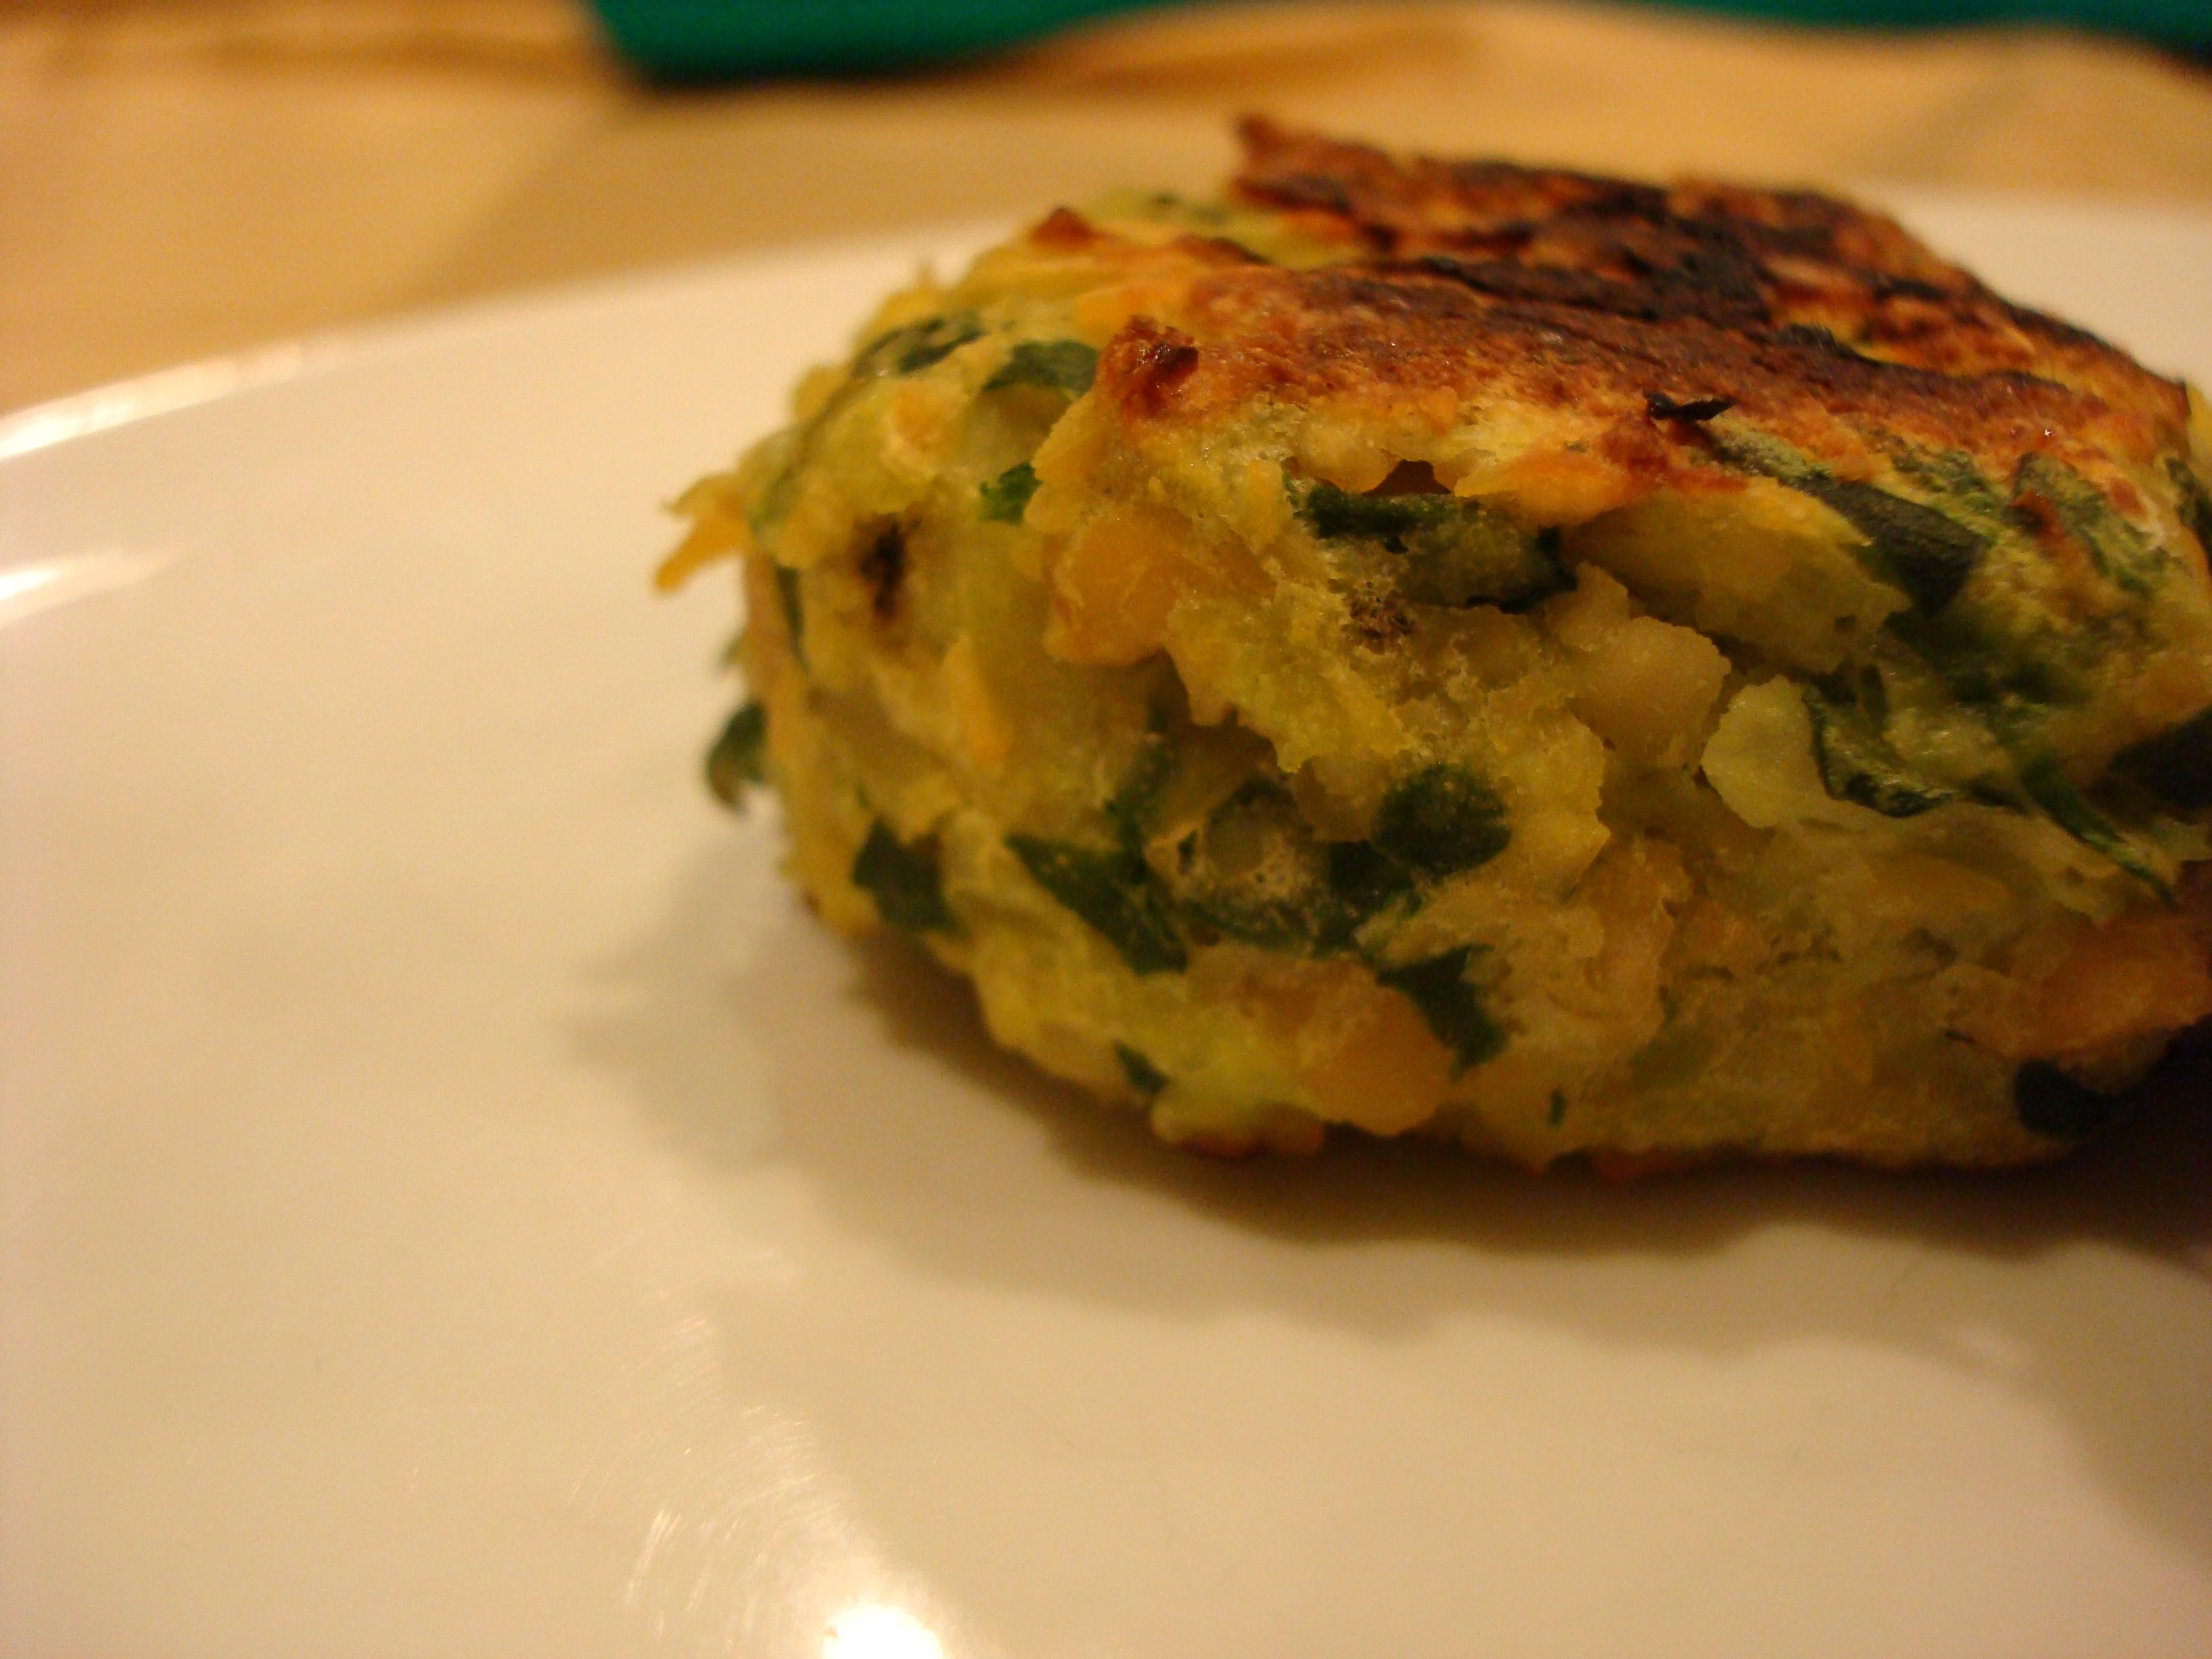 Heidi Swanson's Ultimate Veggie Burger | RhodeyGirl Tests